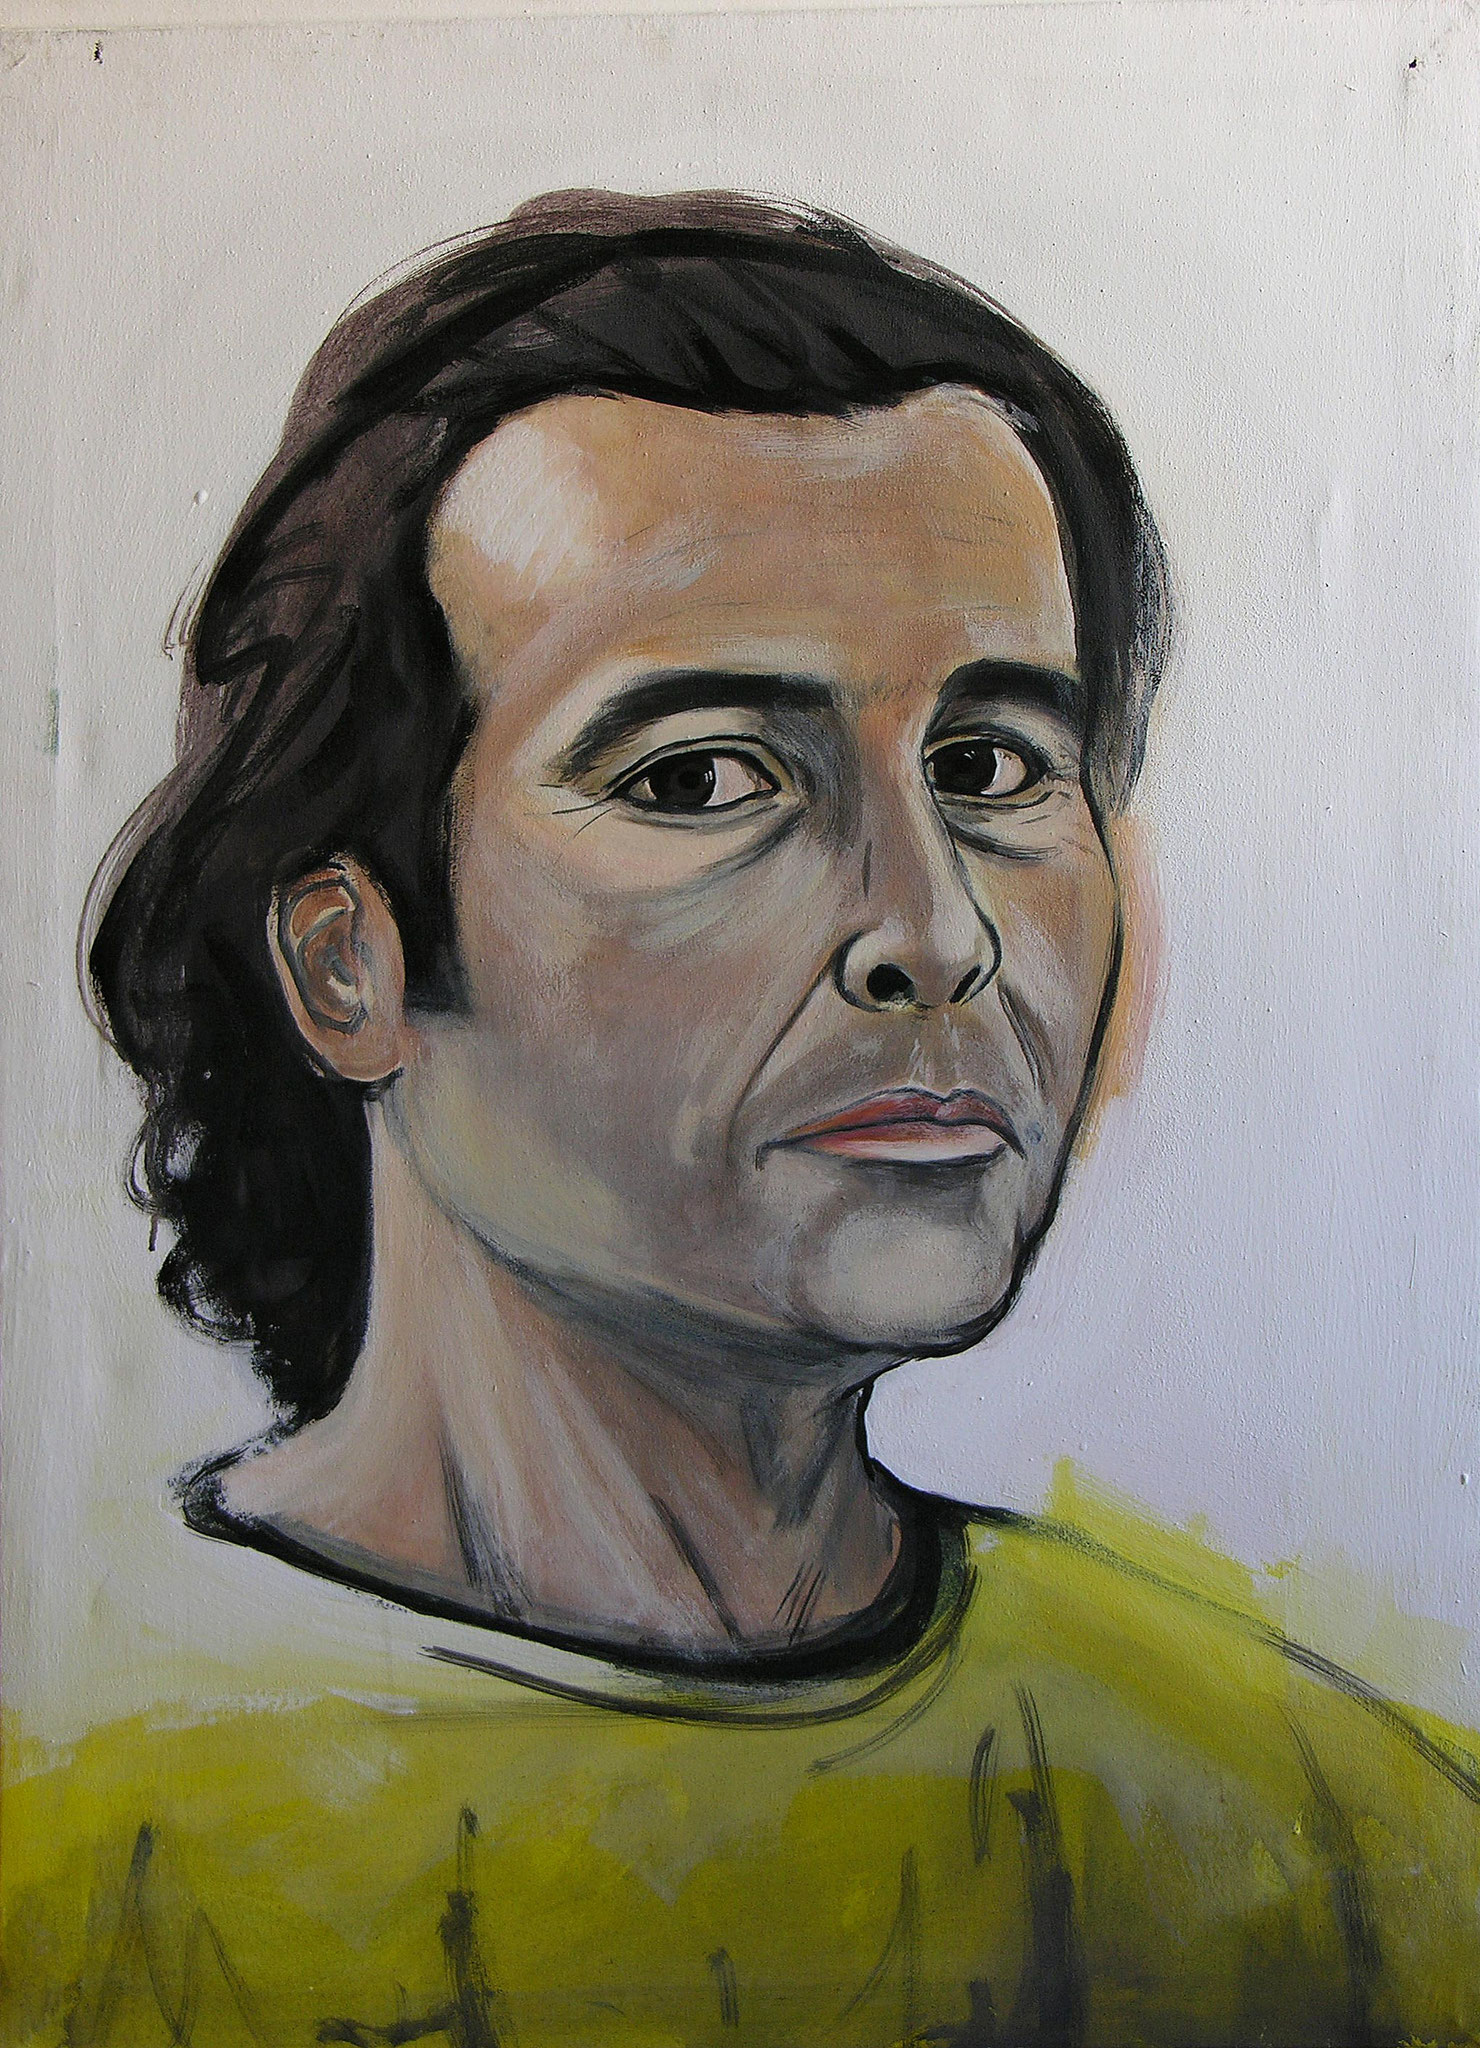 Me, Acrlylic on canvas, 90 x 130 cm, 2005